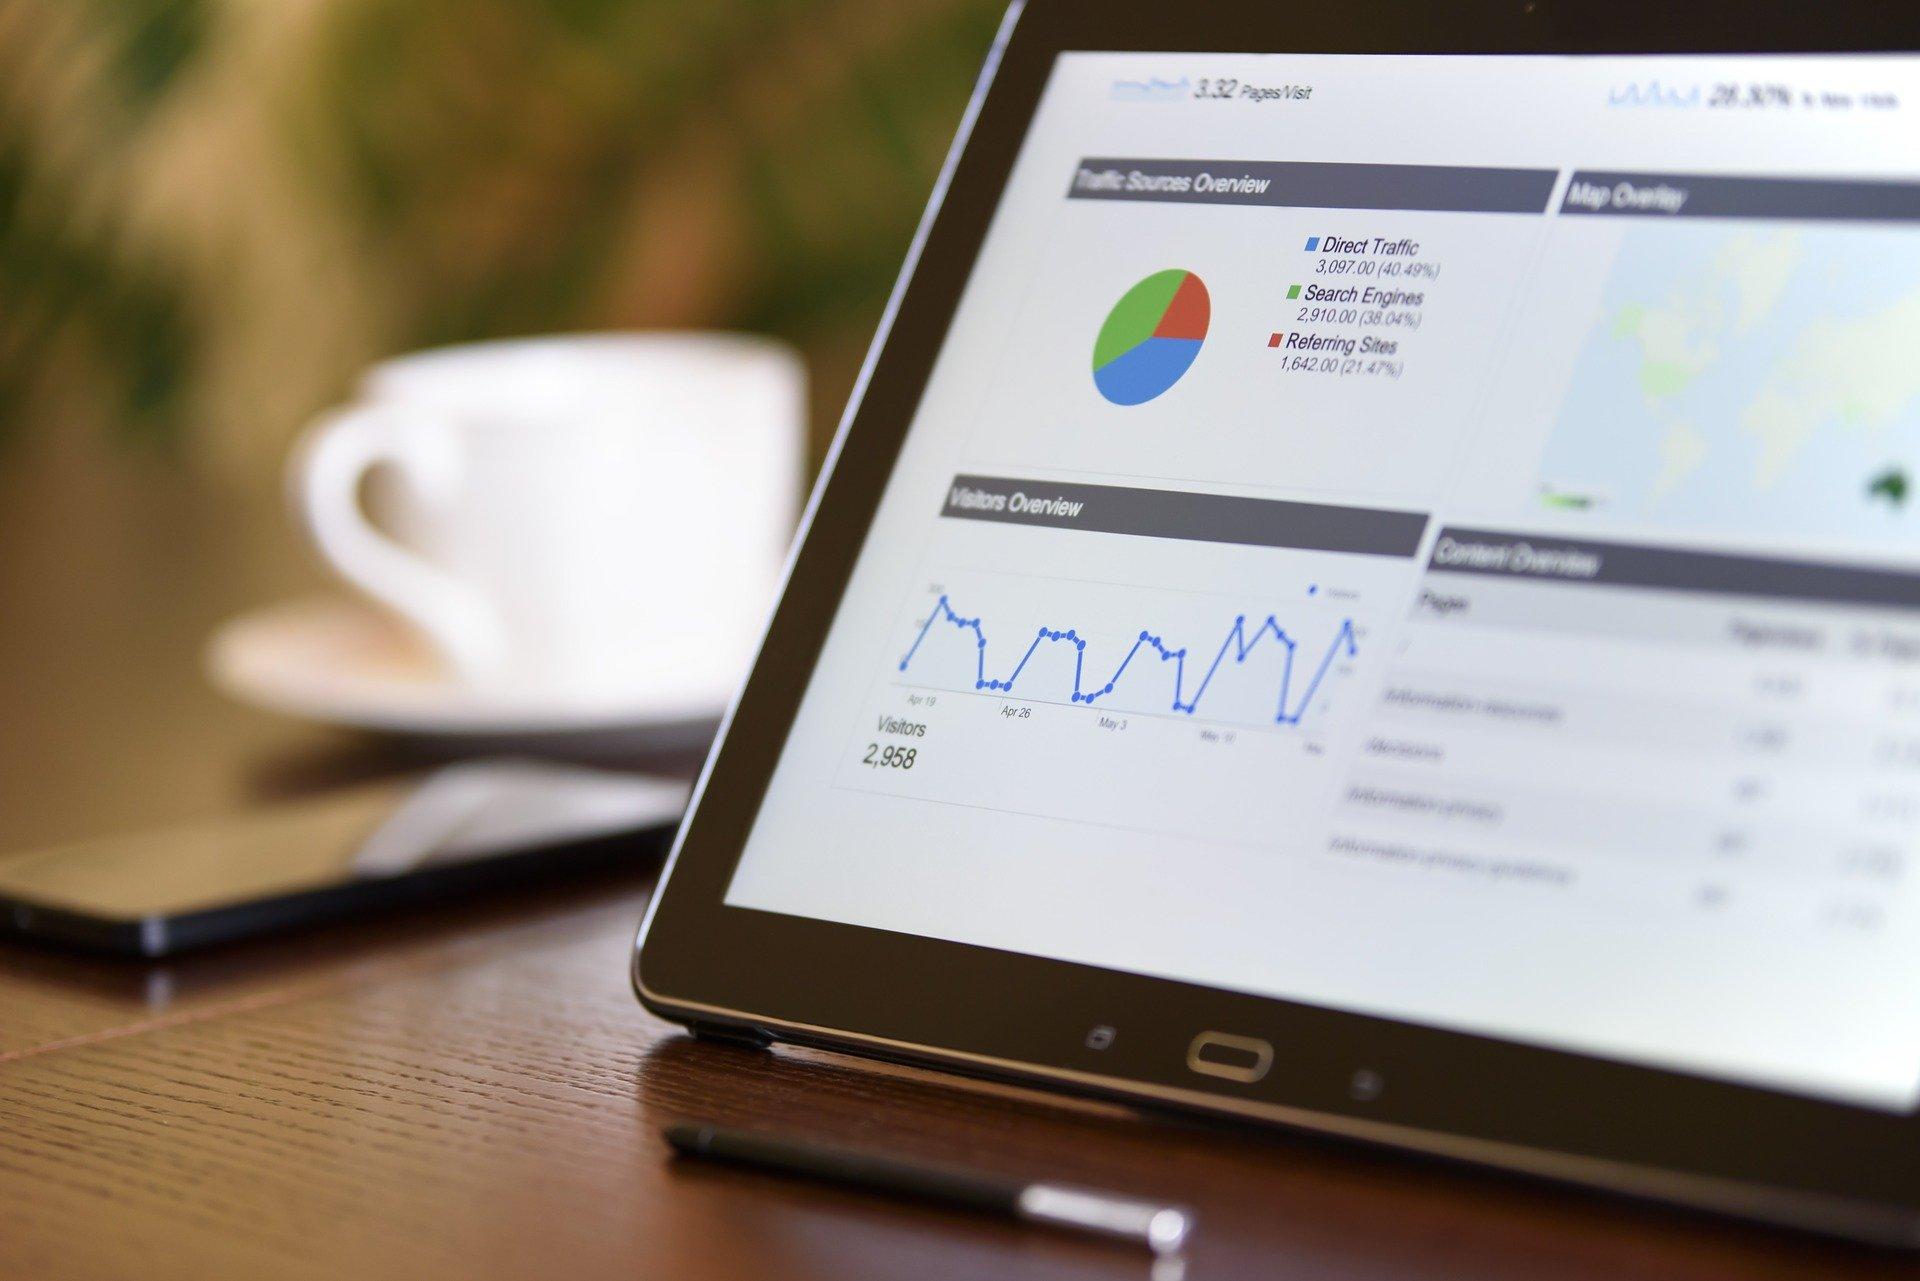 analyse campagne marketing, calcul ROI Excel, QlikView, QlikSense, Power BI